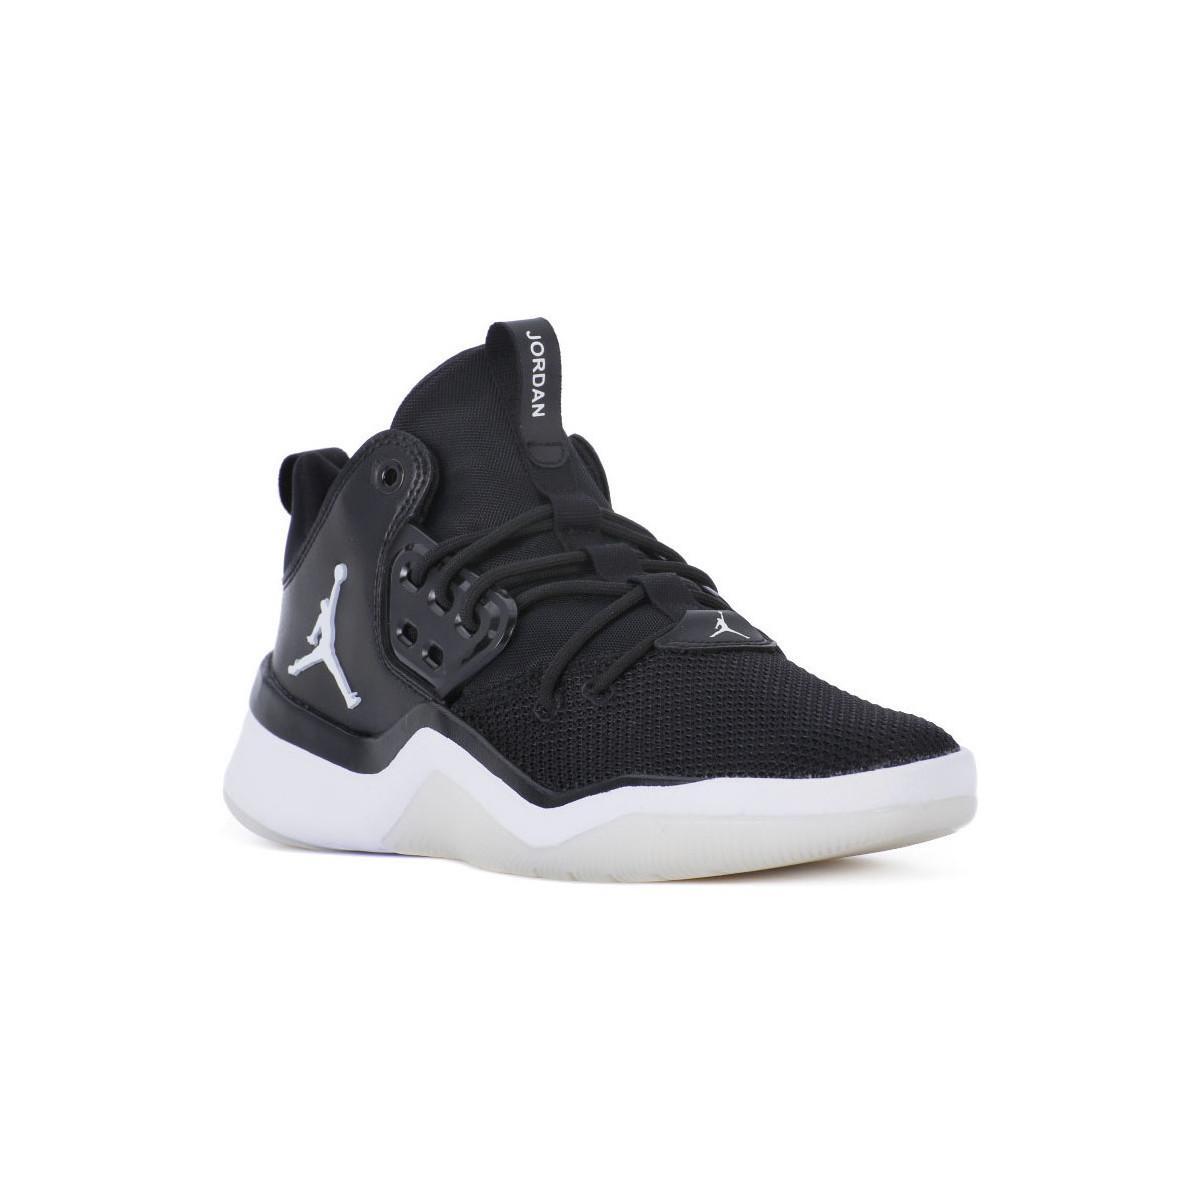 Nike Jordan Dna Men s Shoes (trainers) In Black in Black for Men - Lyst bd7ec5156